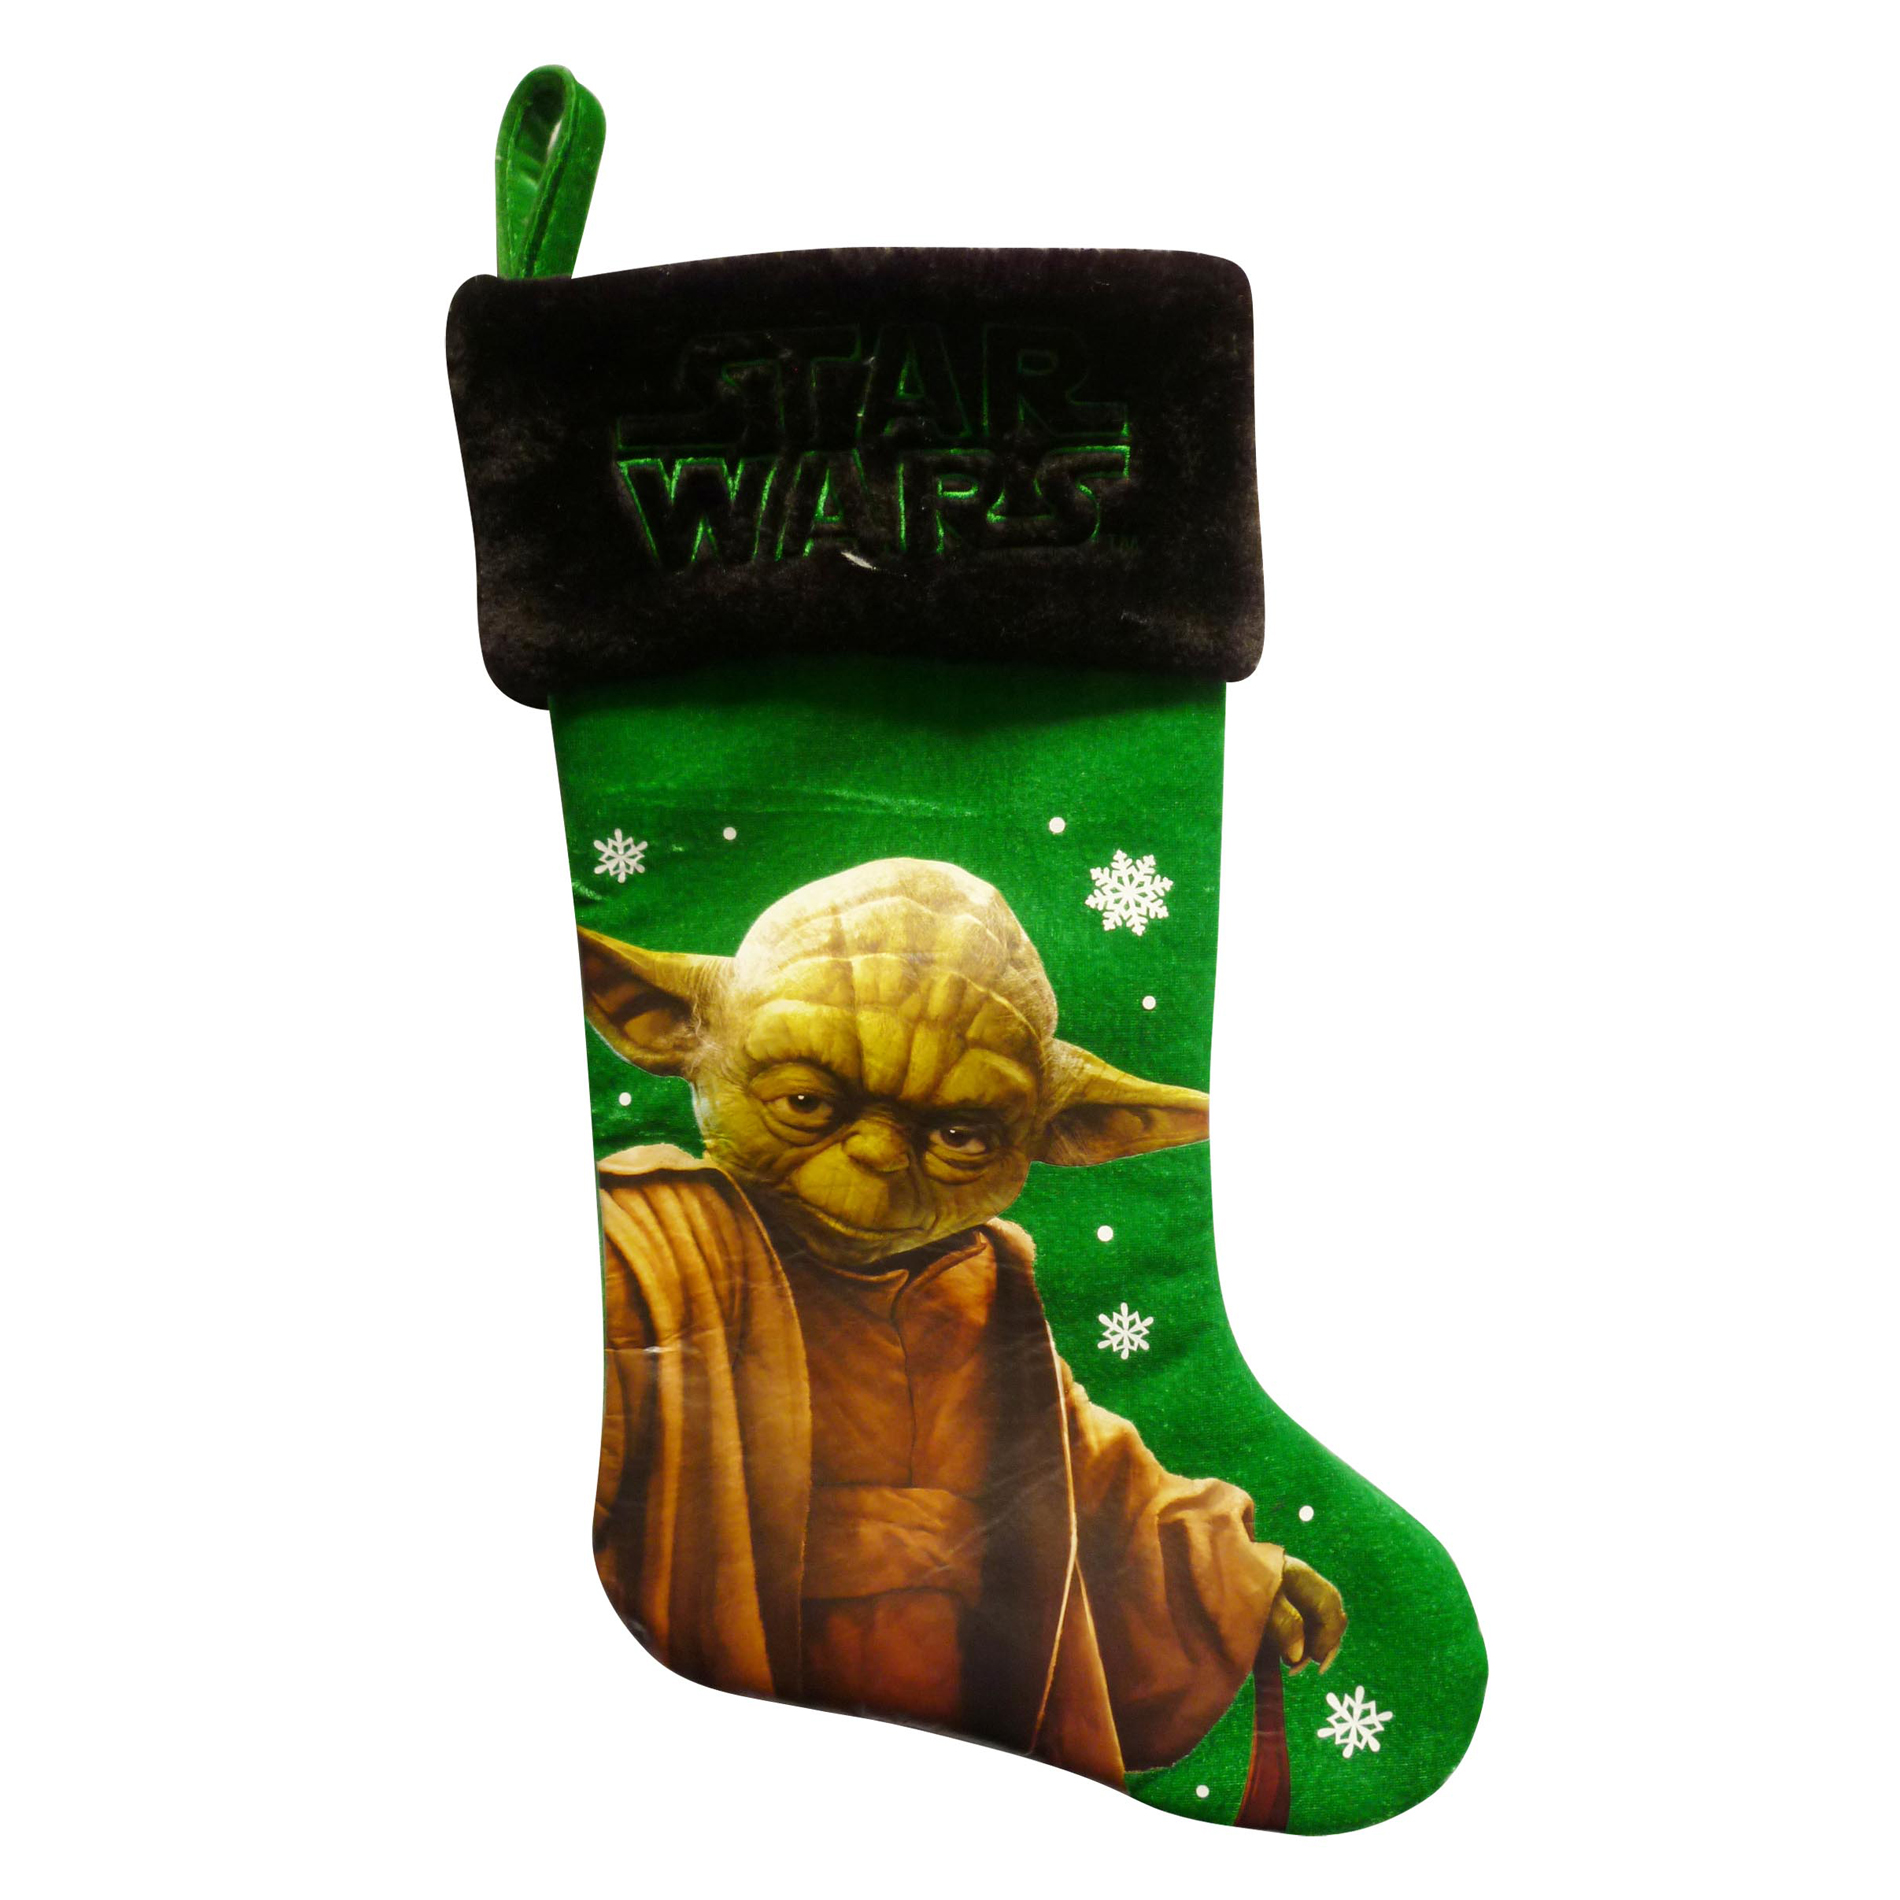 Star Wars 20 Star Wars Yoda Christmas Stocking Seasonal